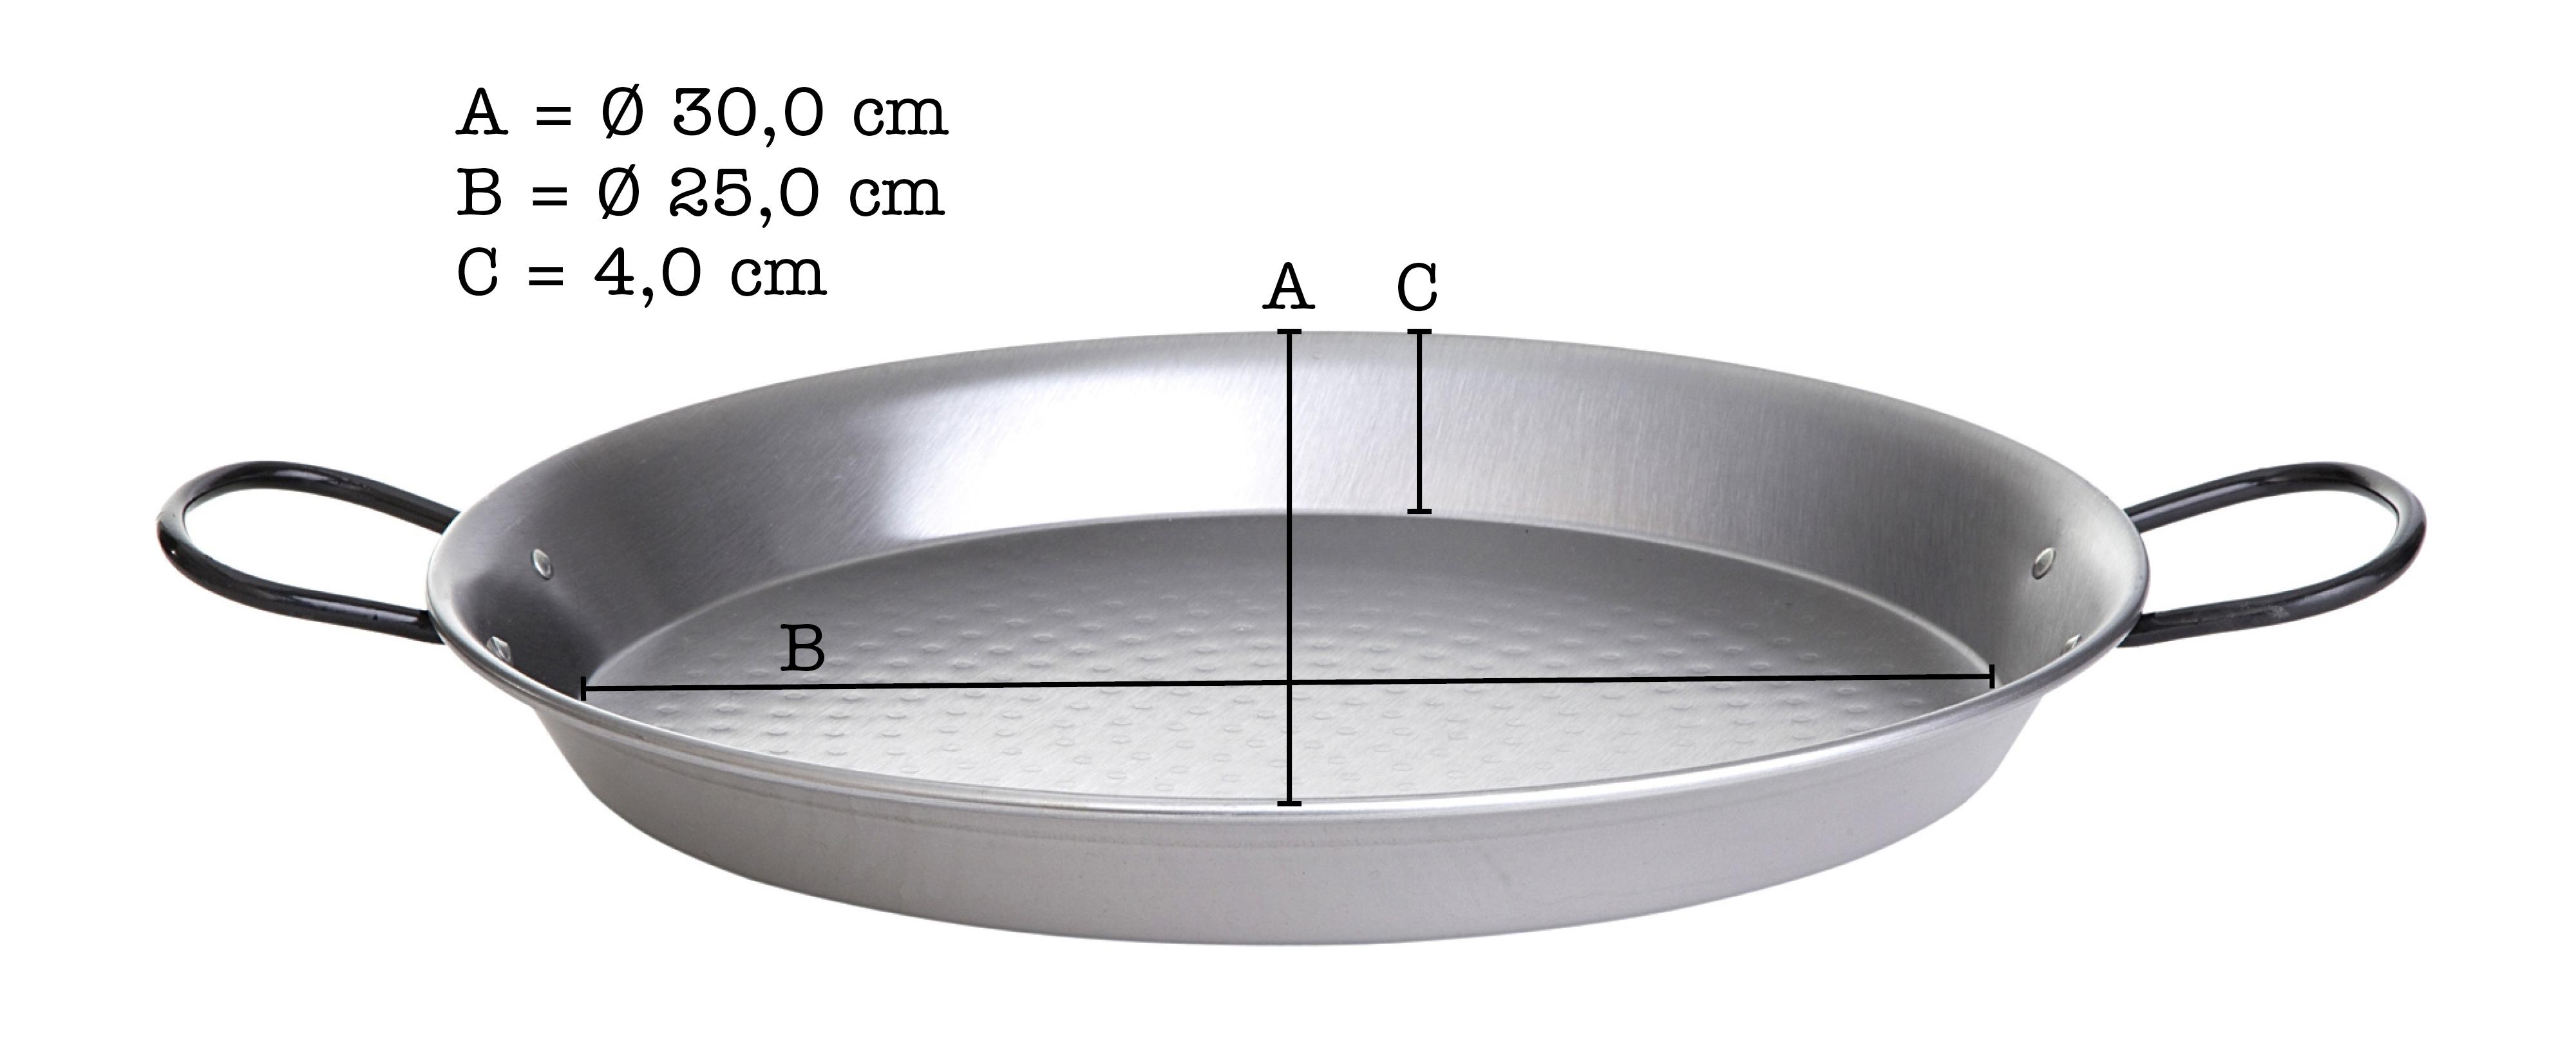 paellapfanne stahl poliert durchmesser 30 cm. Black Bedroom Furniture Sets. Home Design Ideas